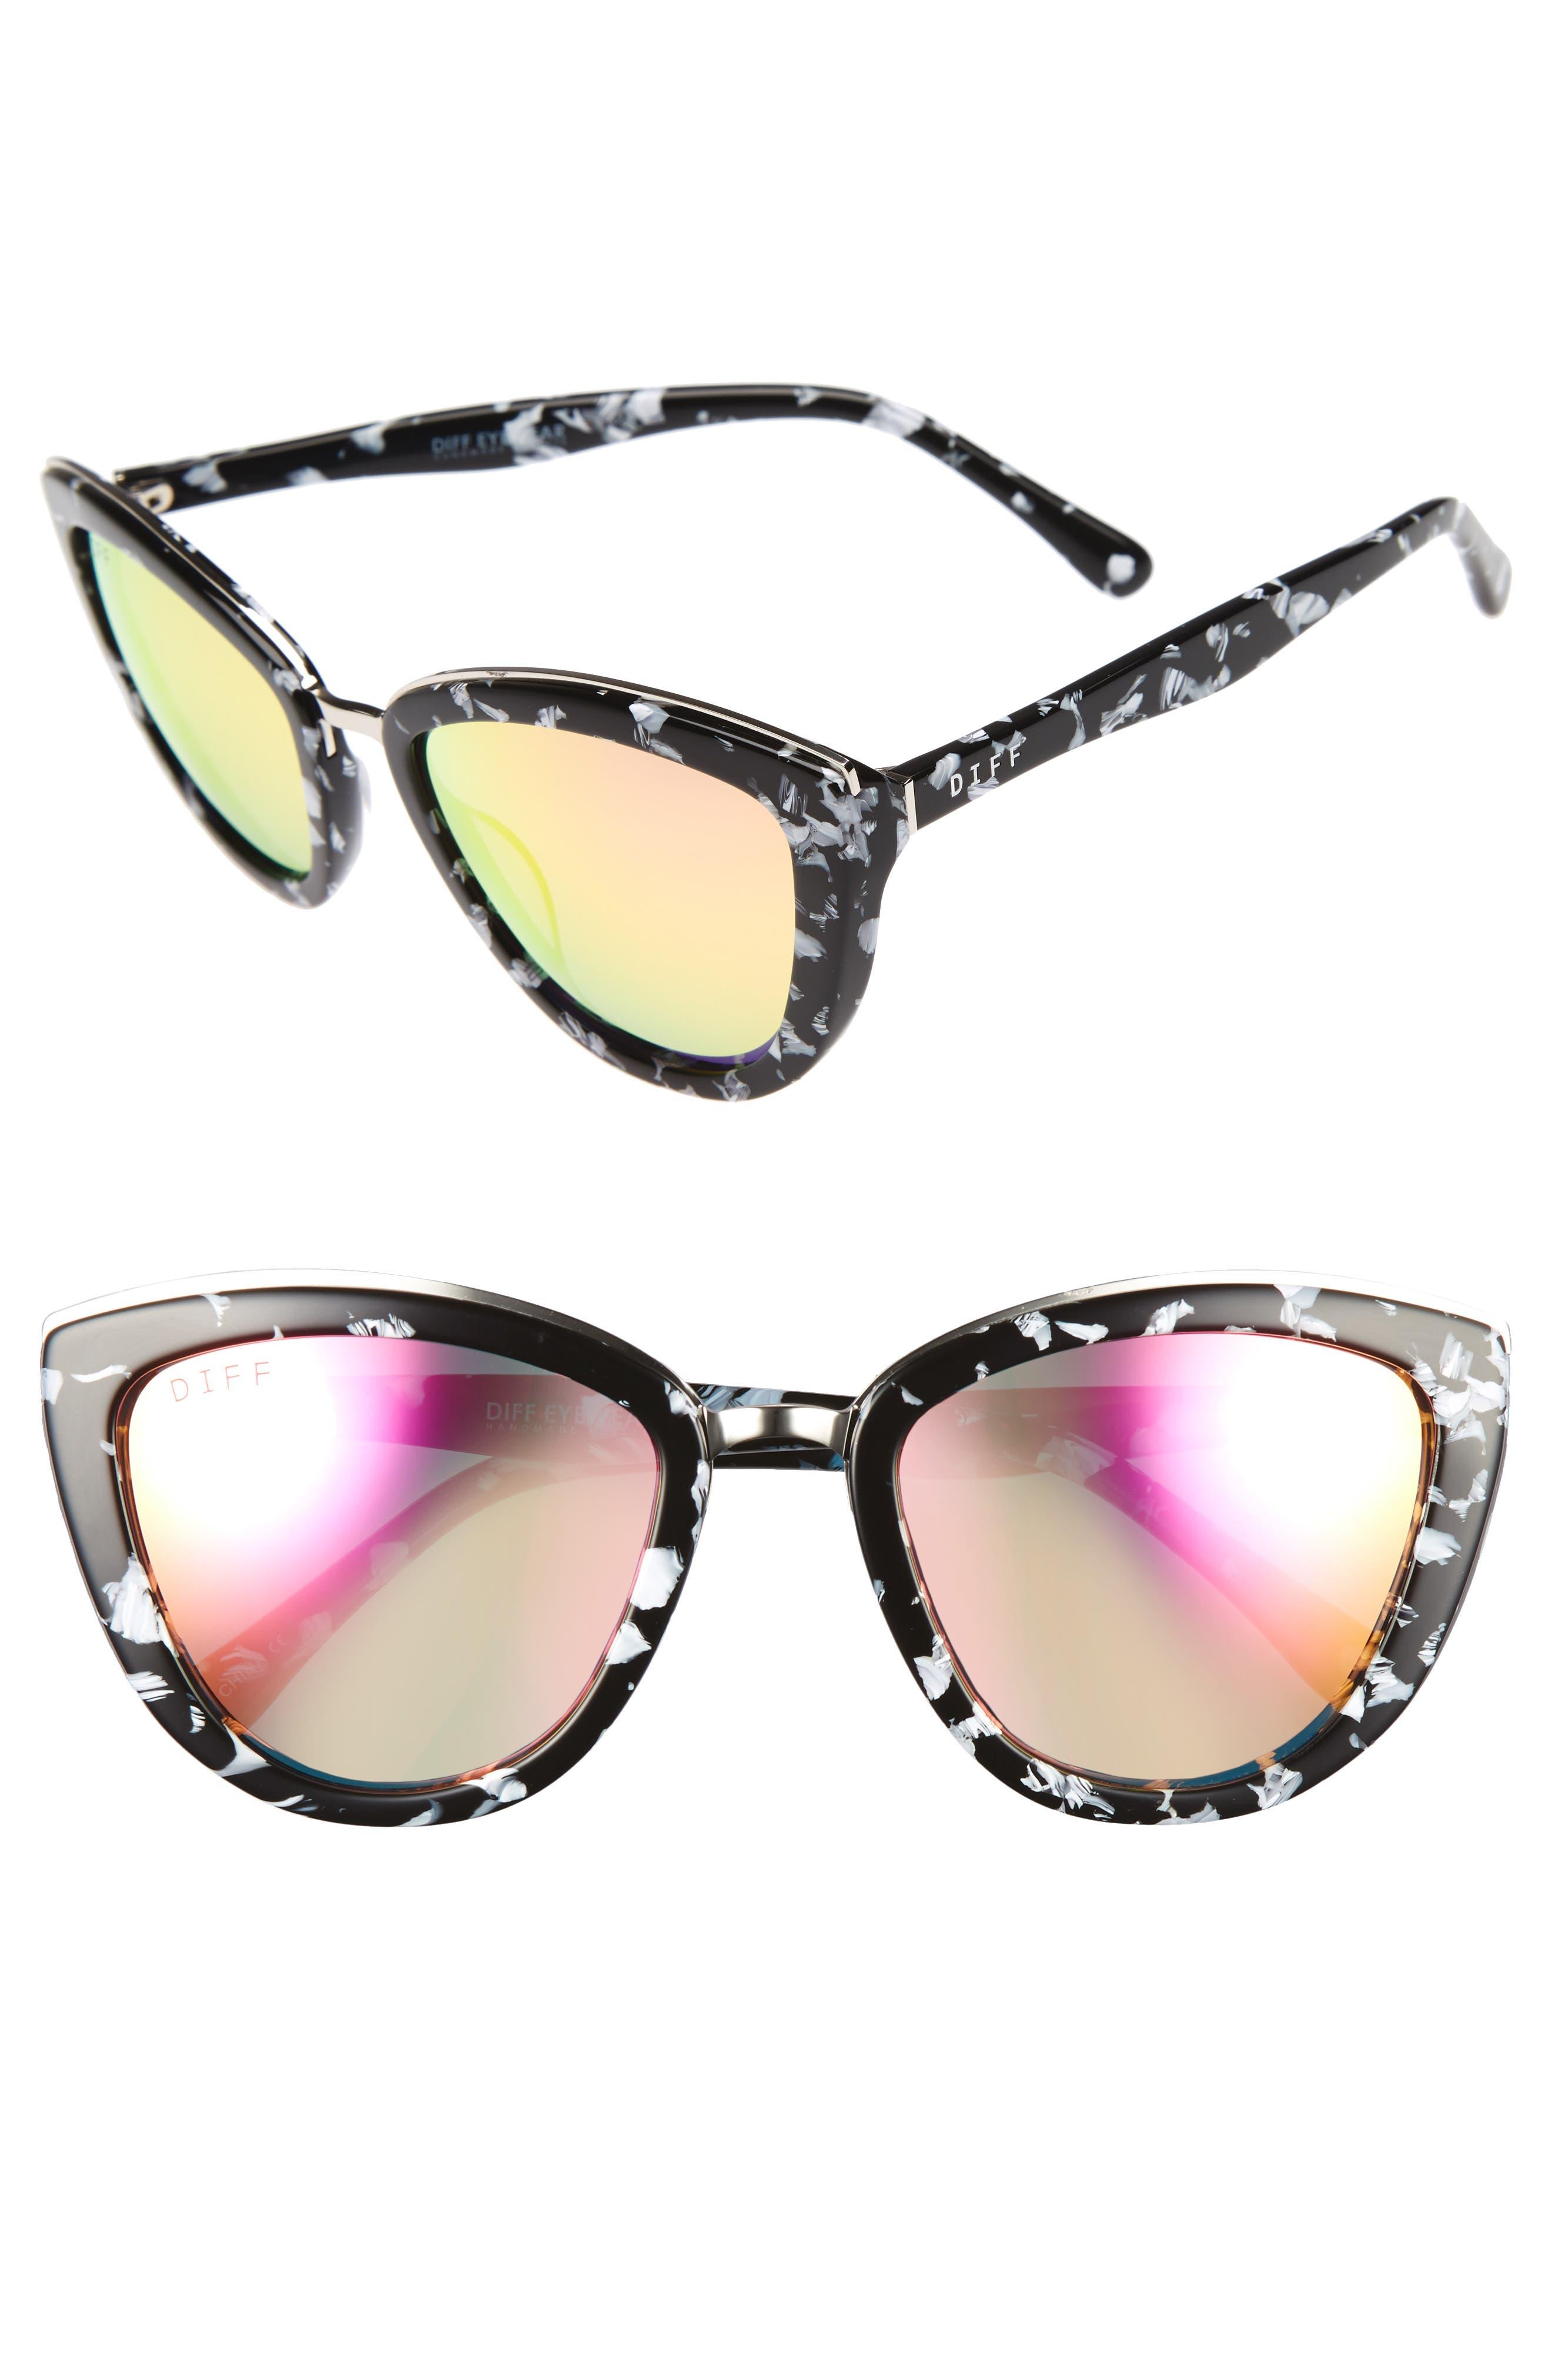 Alternate Image 1 Selected - DIFF Rose 56mm Cat Eye Sunglasses